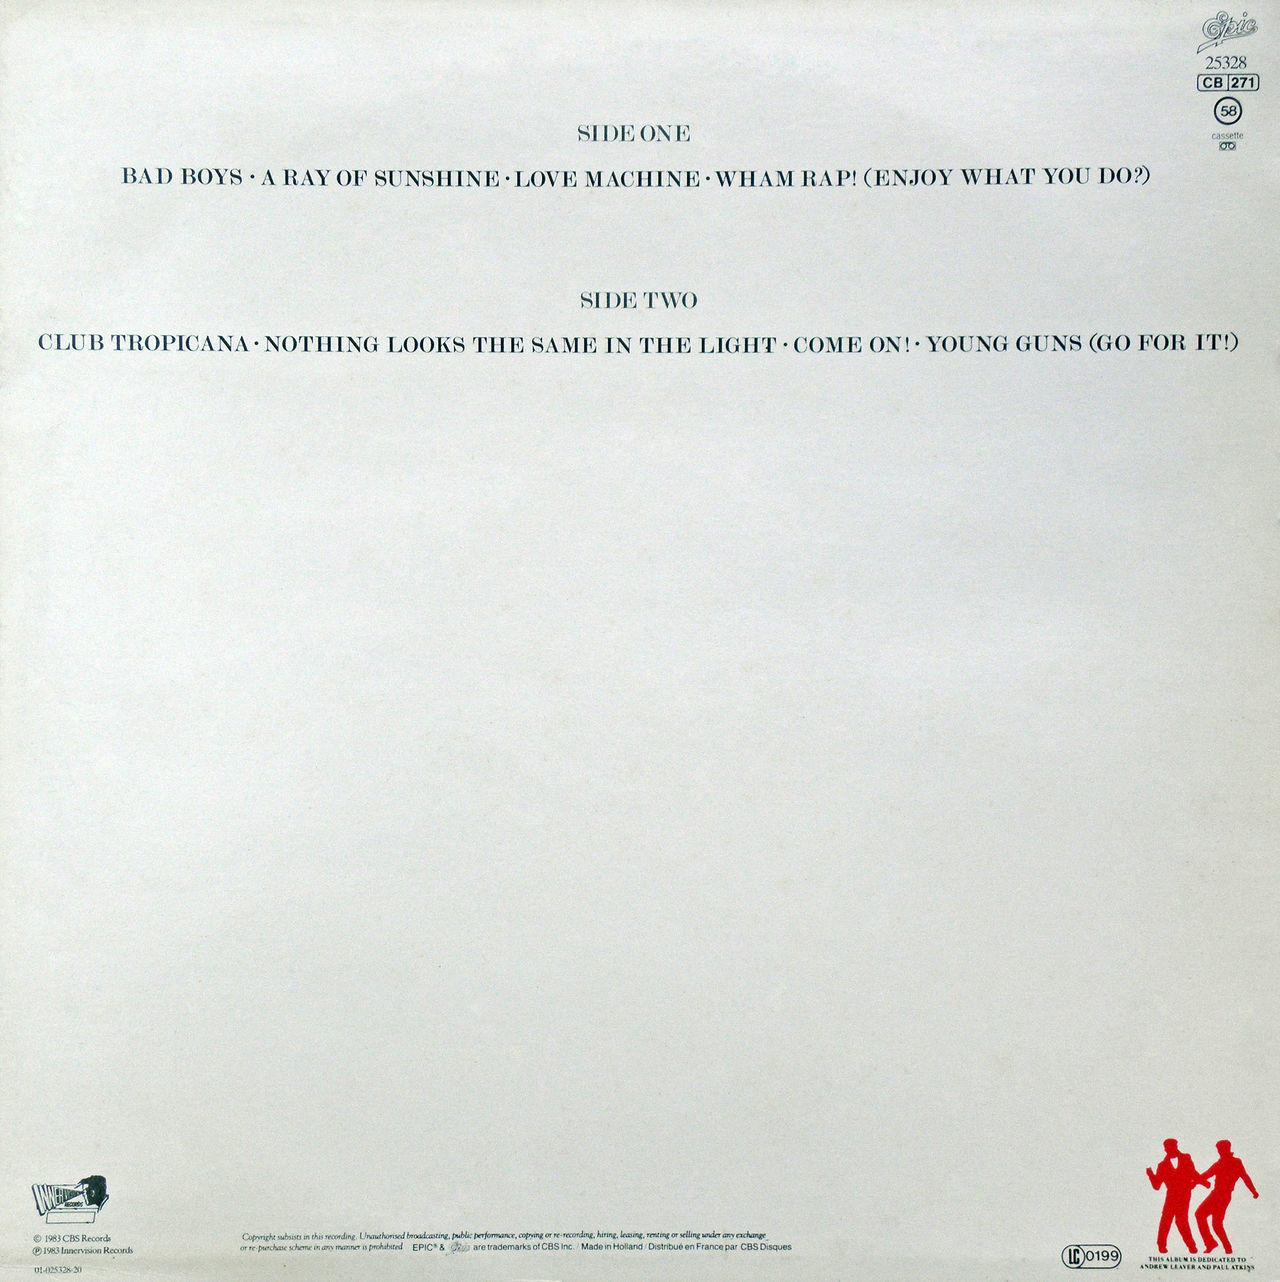 Wham! LP 'Fantastic', gramophone record back side, George Michael & Andrew Ridgeley 1983. 1983. Album Andrew Ridgeley Charts Fantastic George Michael Gramophone Record In Memoriam LP Music Musician Pop Popular Singer  Songwriter Stars WHAM!